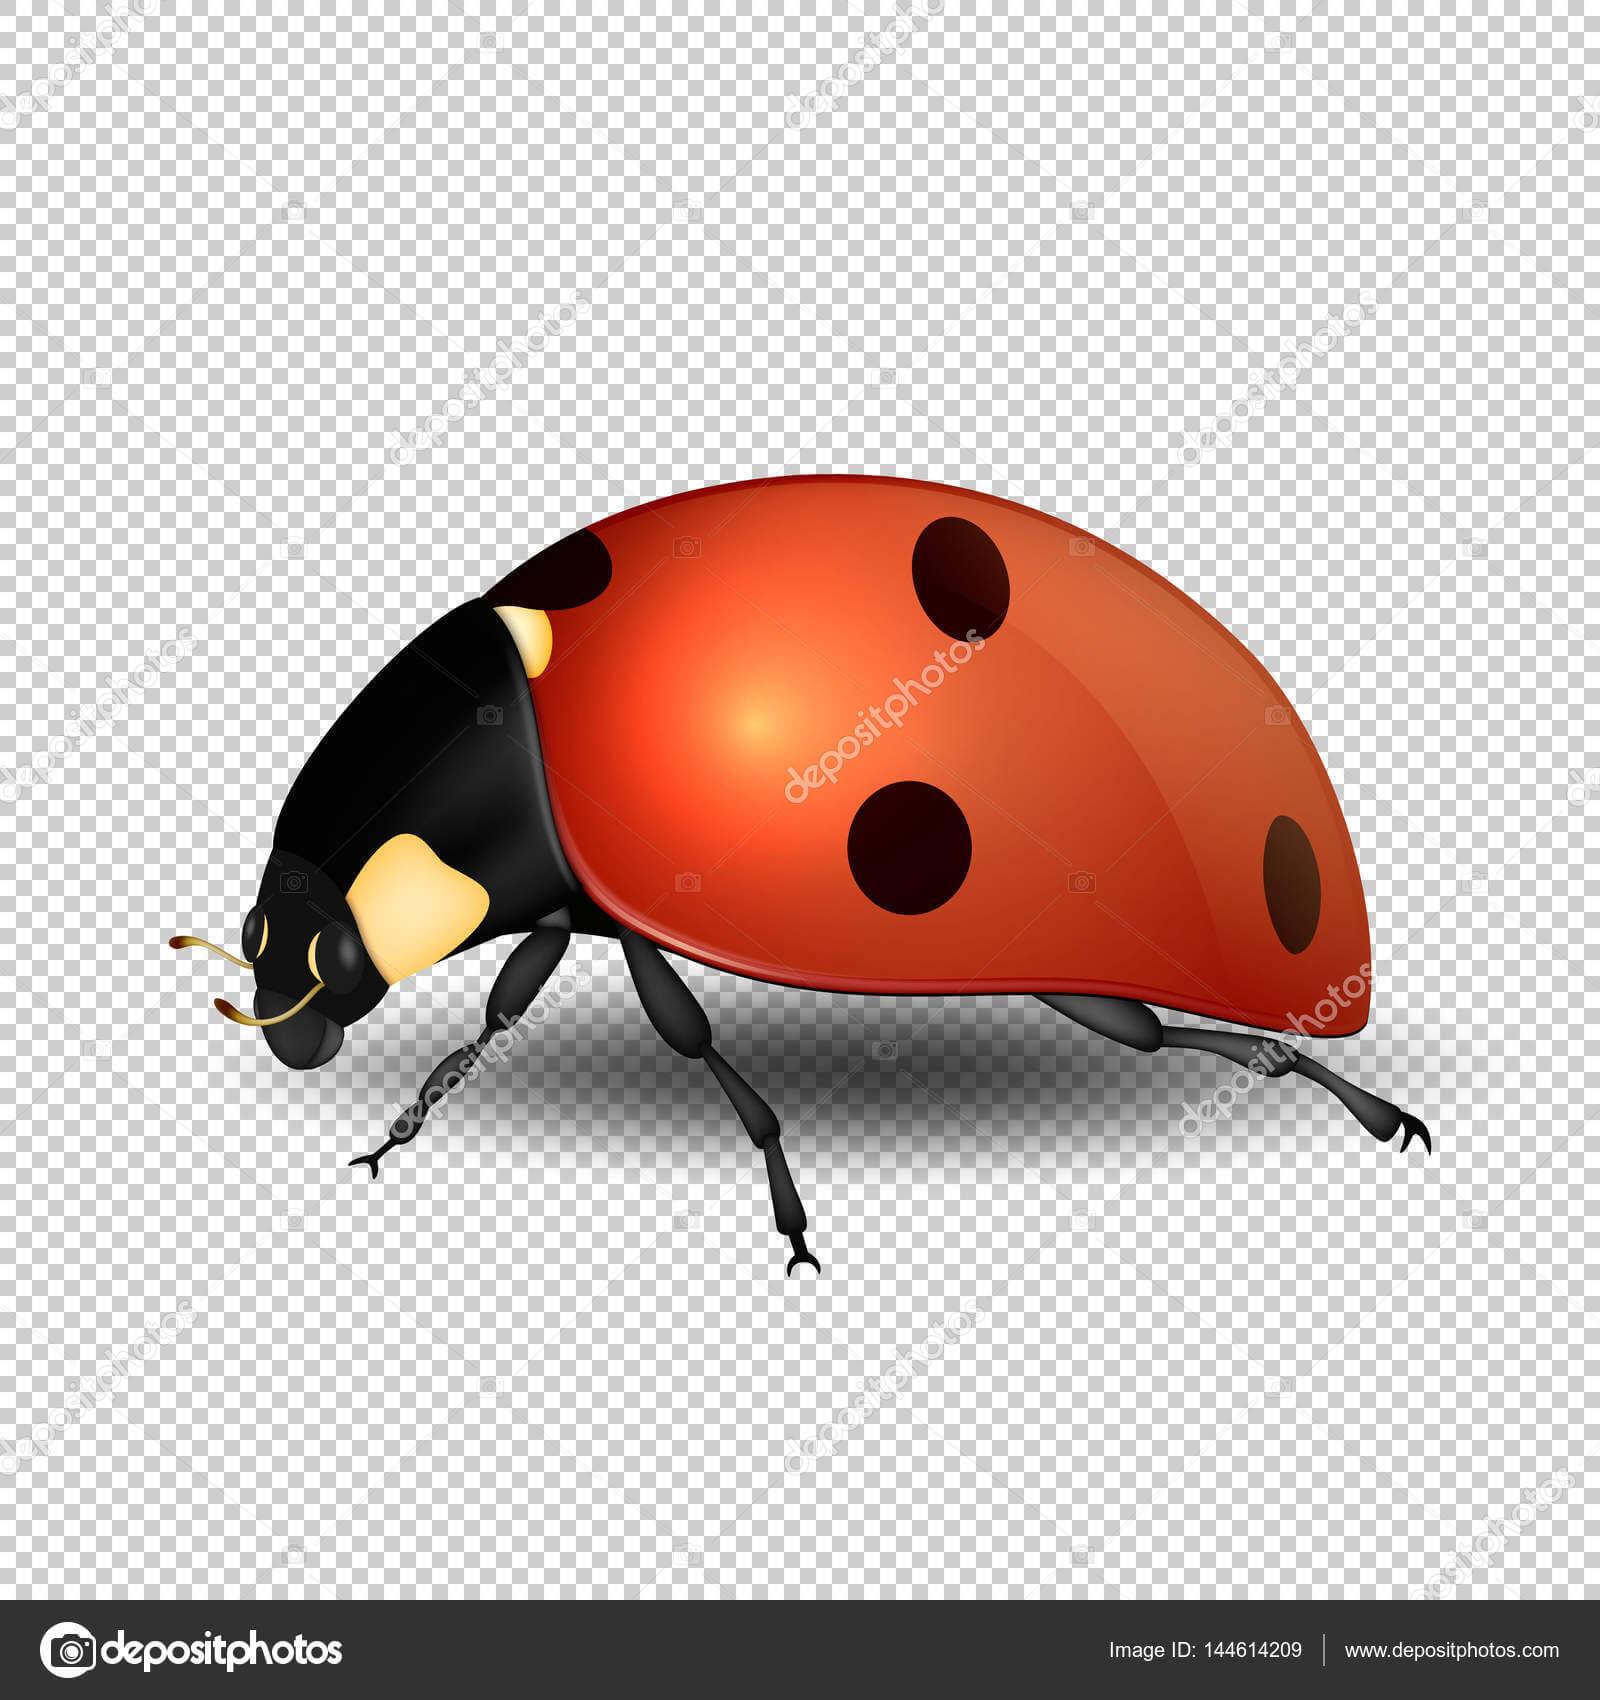 Blank Ladybug Template   Vector Close Up Realistic Ladybug With Regard To Blank Ladybug Template